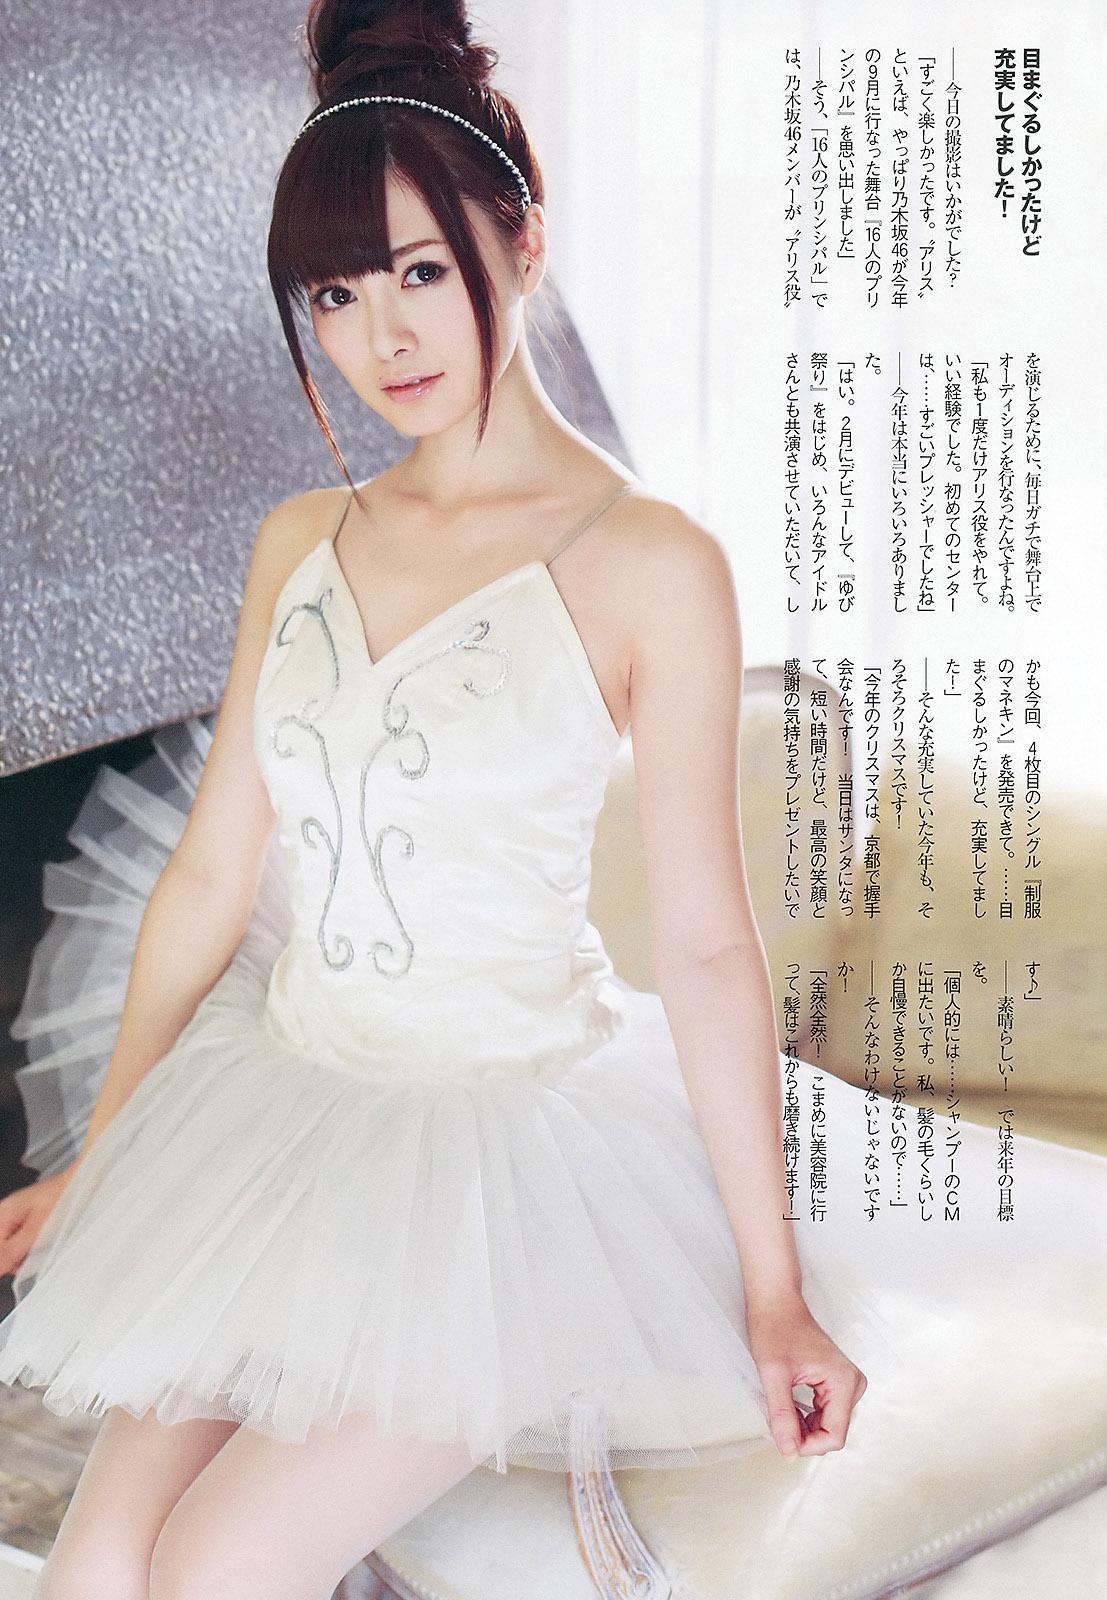 MShiraishi WPB 121231 03.jpg